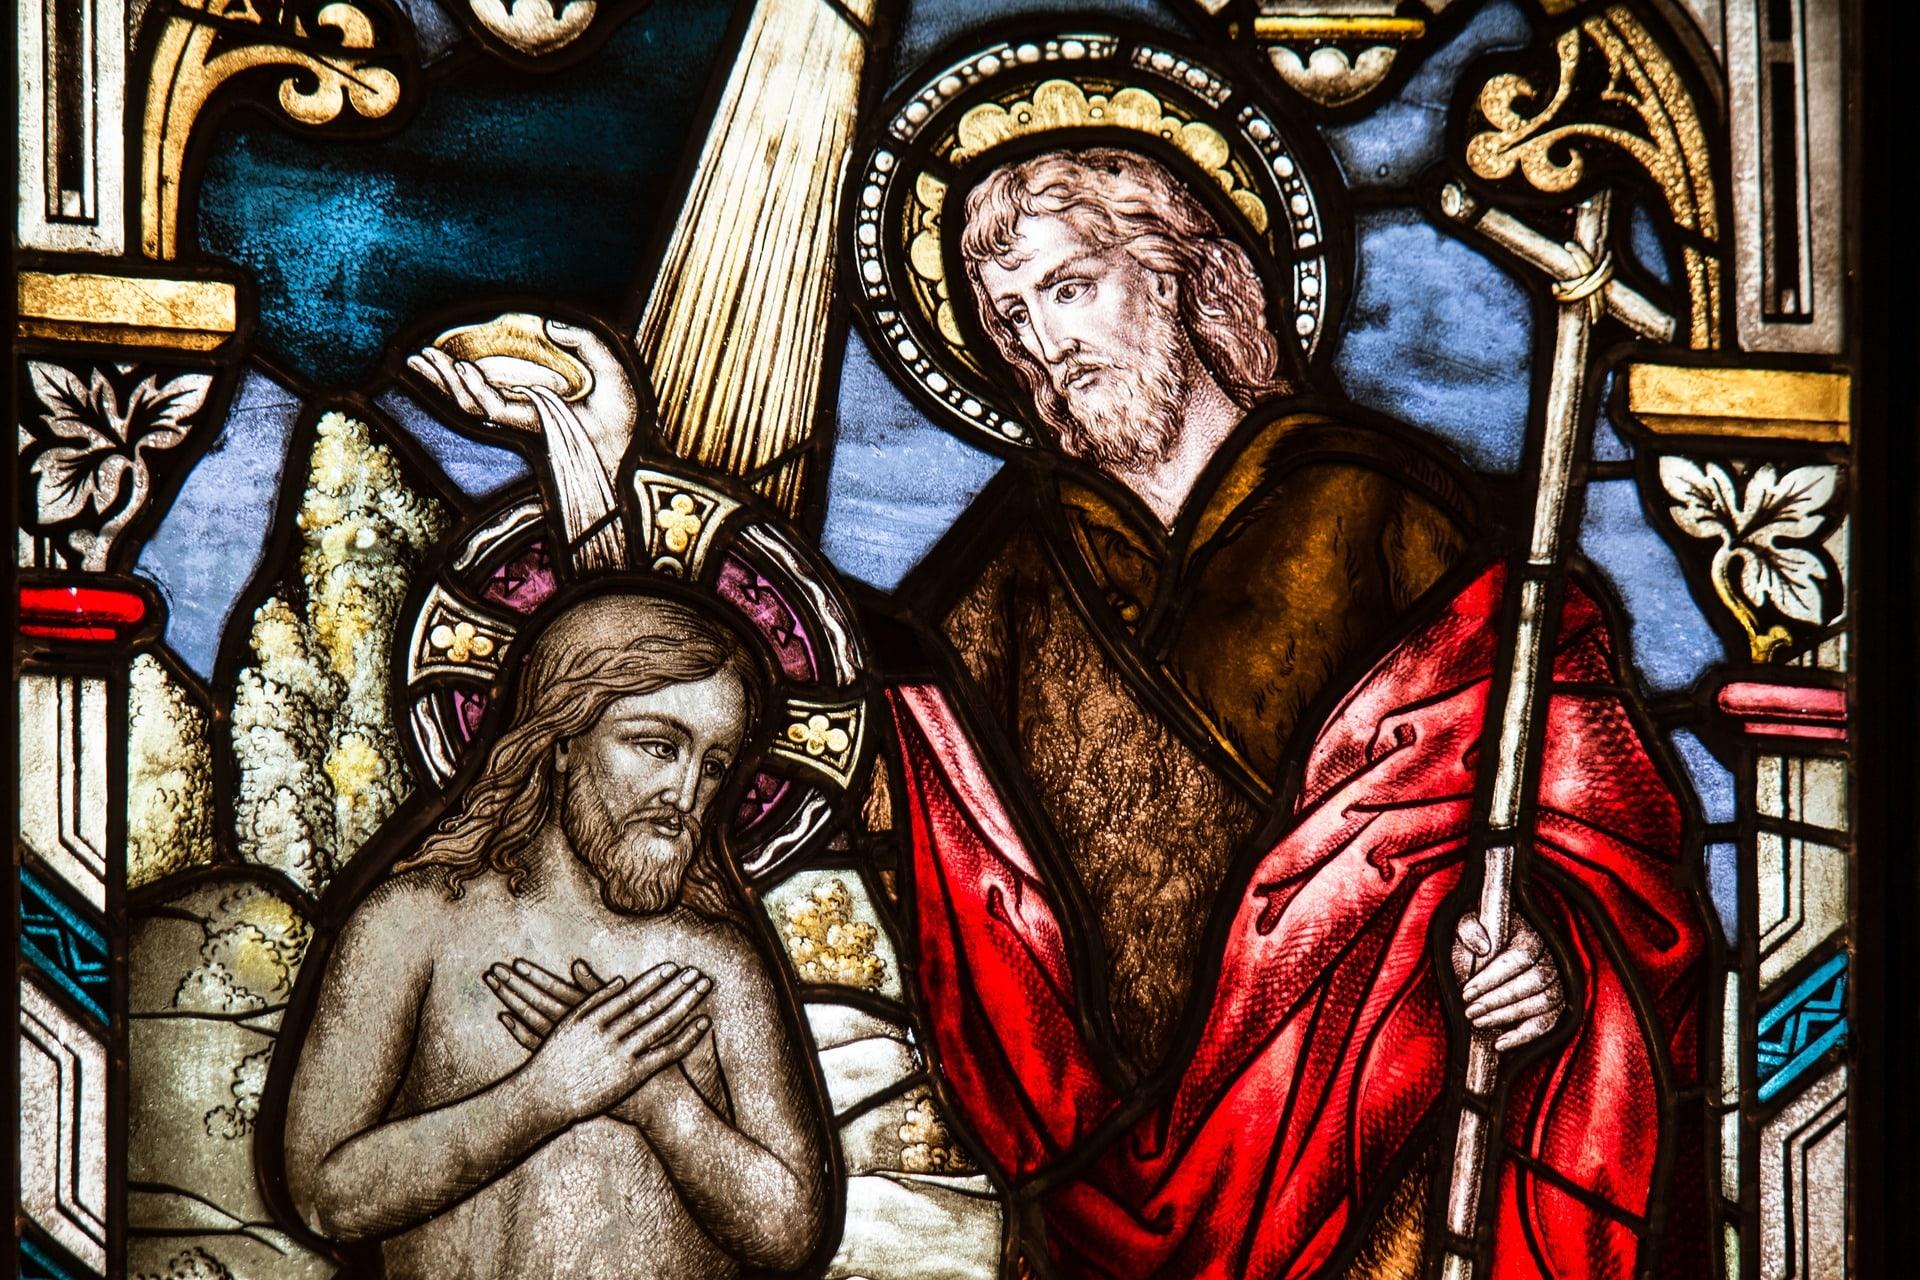 stained glass church-window-Jesus representation